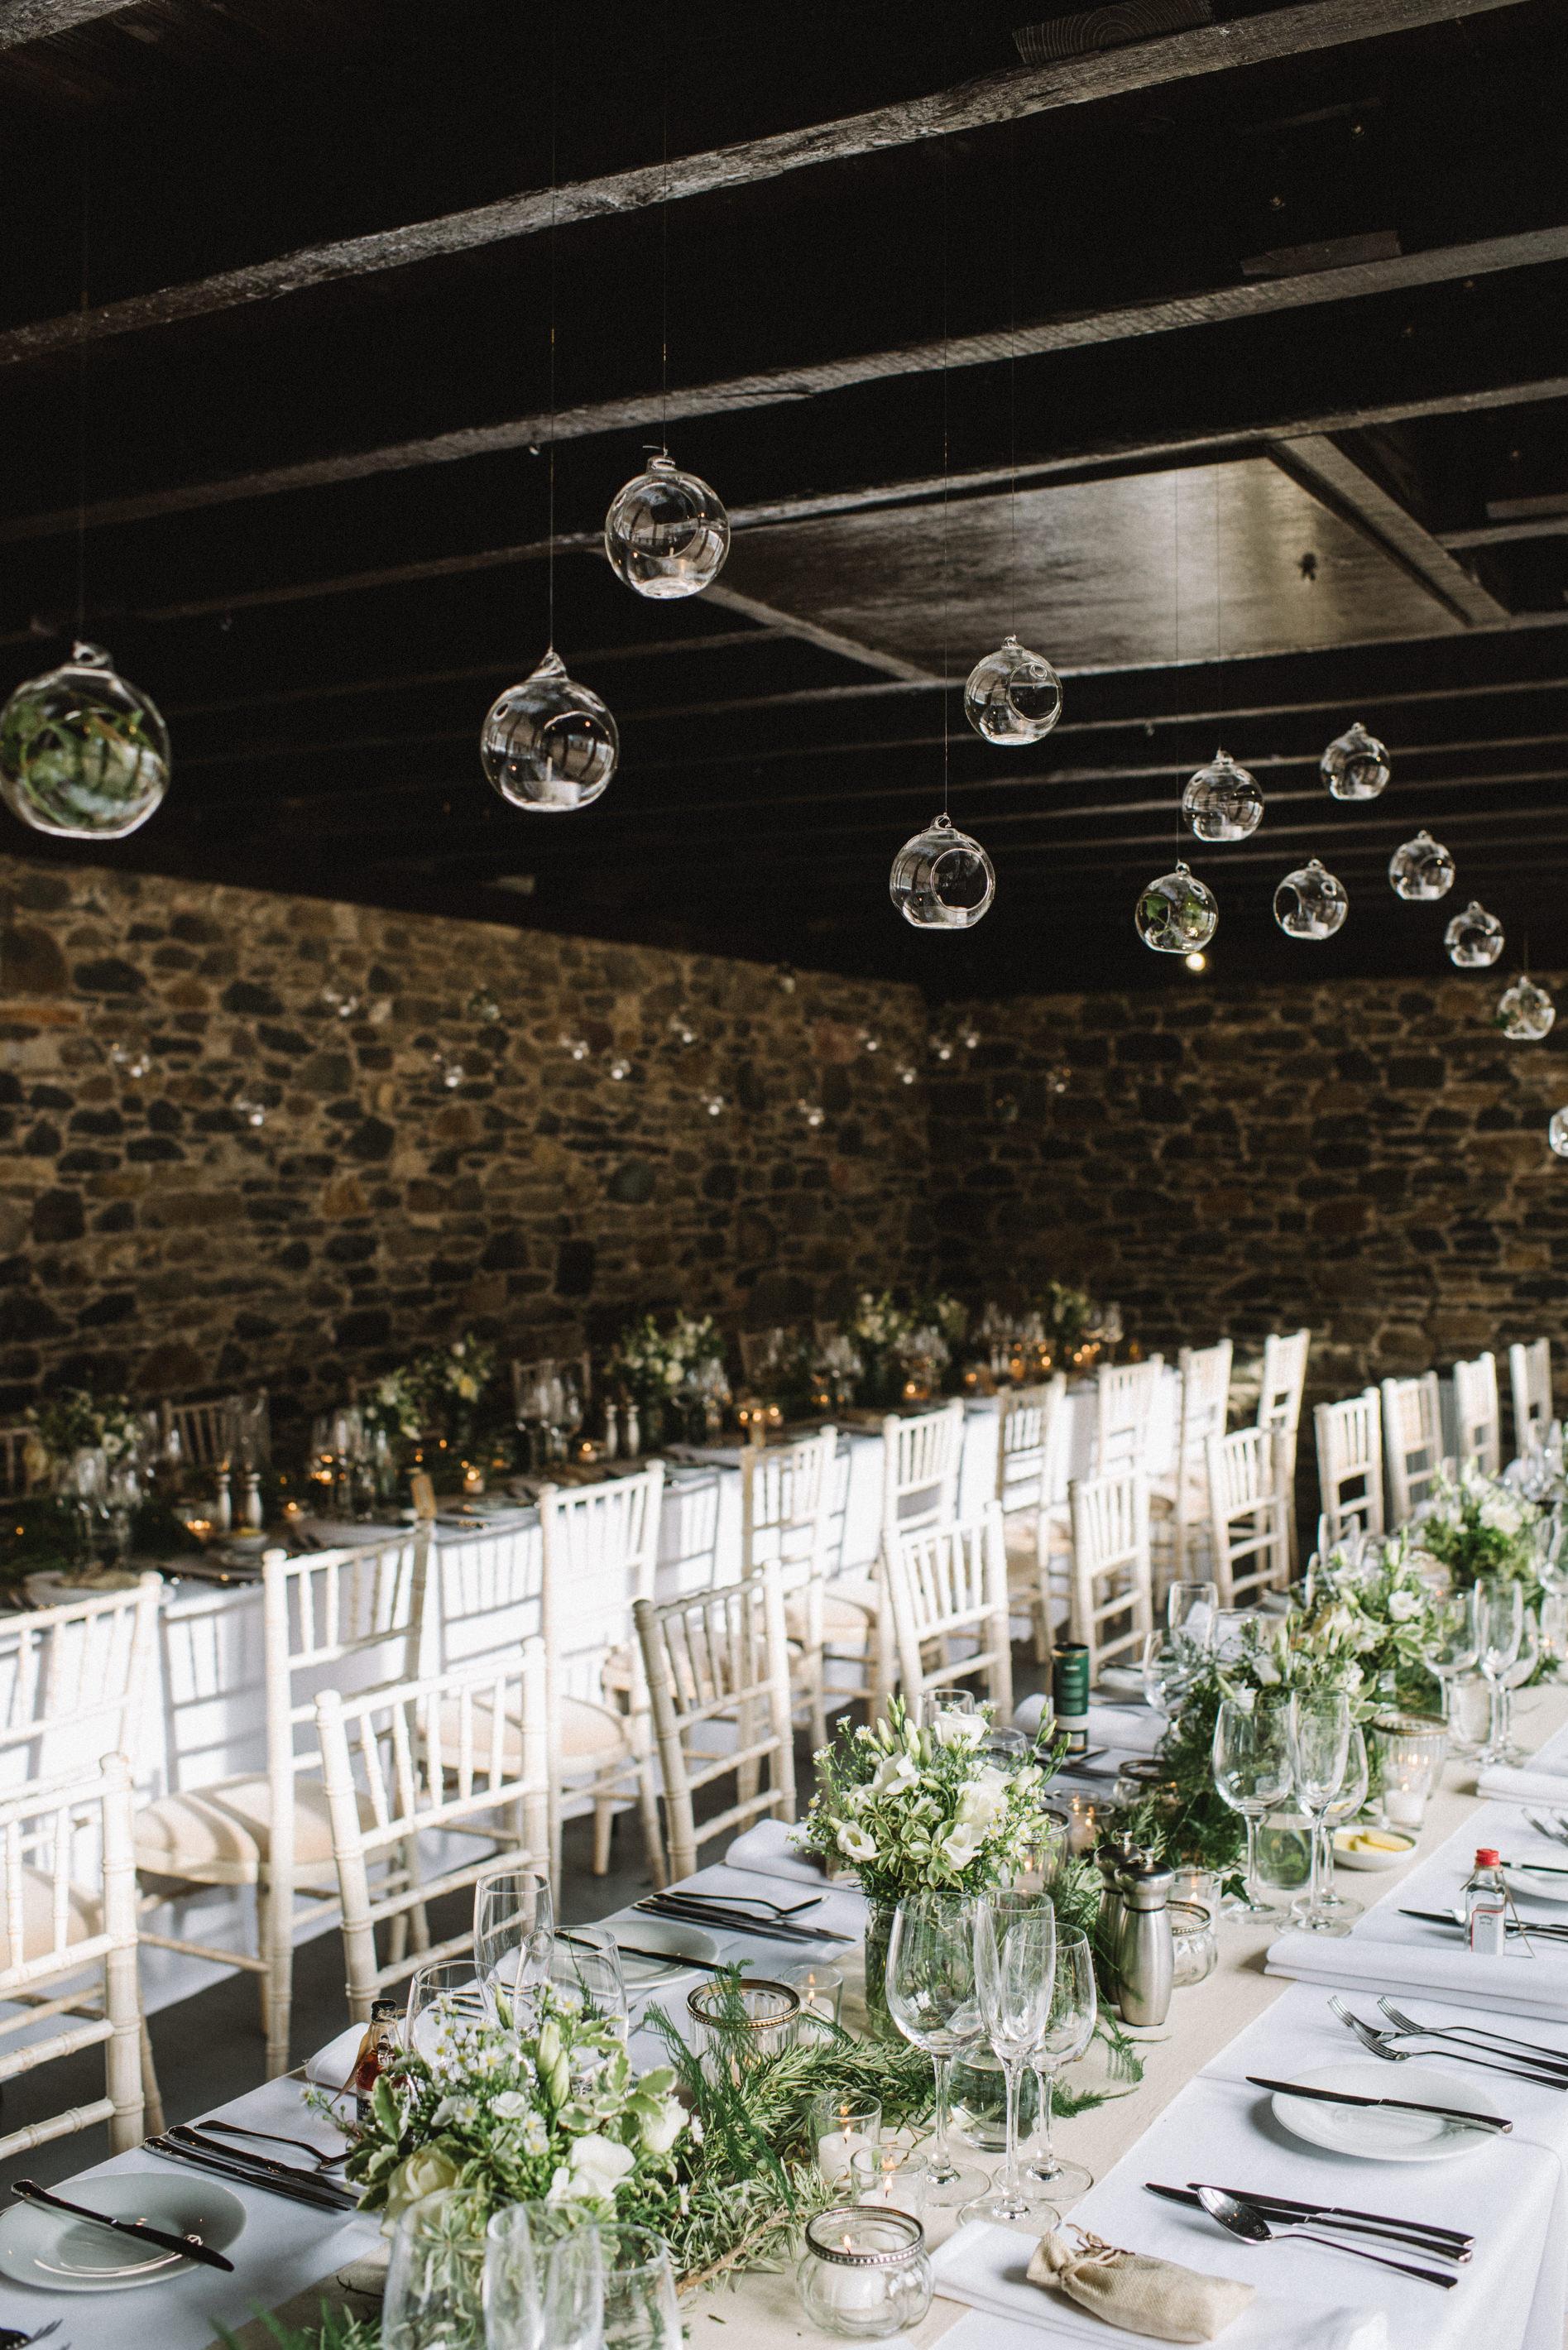 0185-LISA-DEVINE-PHOTOGRAPHY-ALTERNATIVE-WEDDING-PHOTOGRAPHY-SCOTLAND-DESTINATION-WEDDINGS-GLASGOW-WEDDINGS-COOL-WEDDINGS-STYLISH-WEDDINGS.JPG